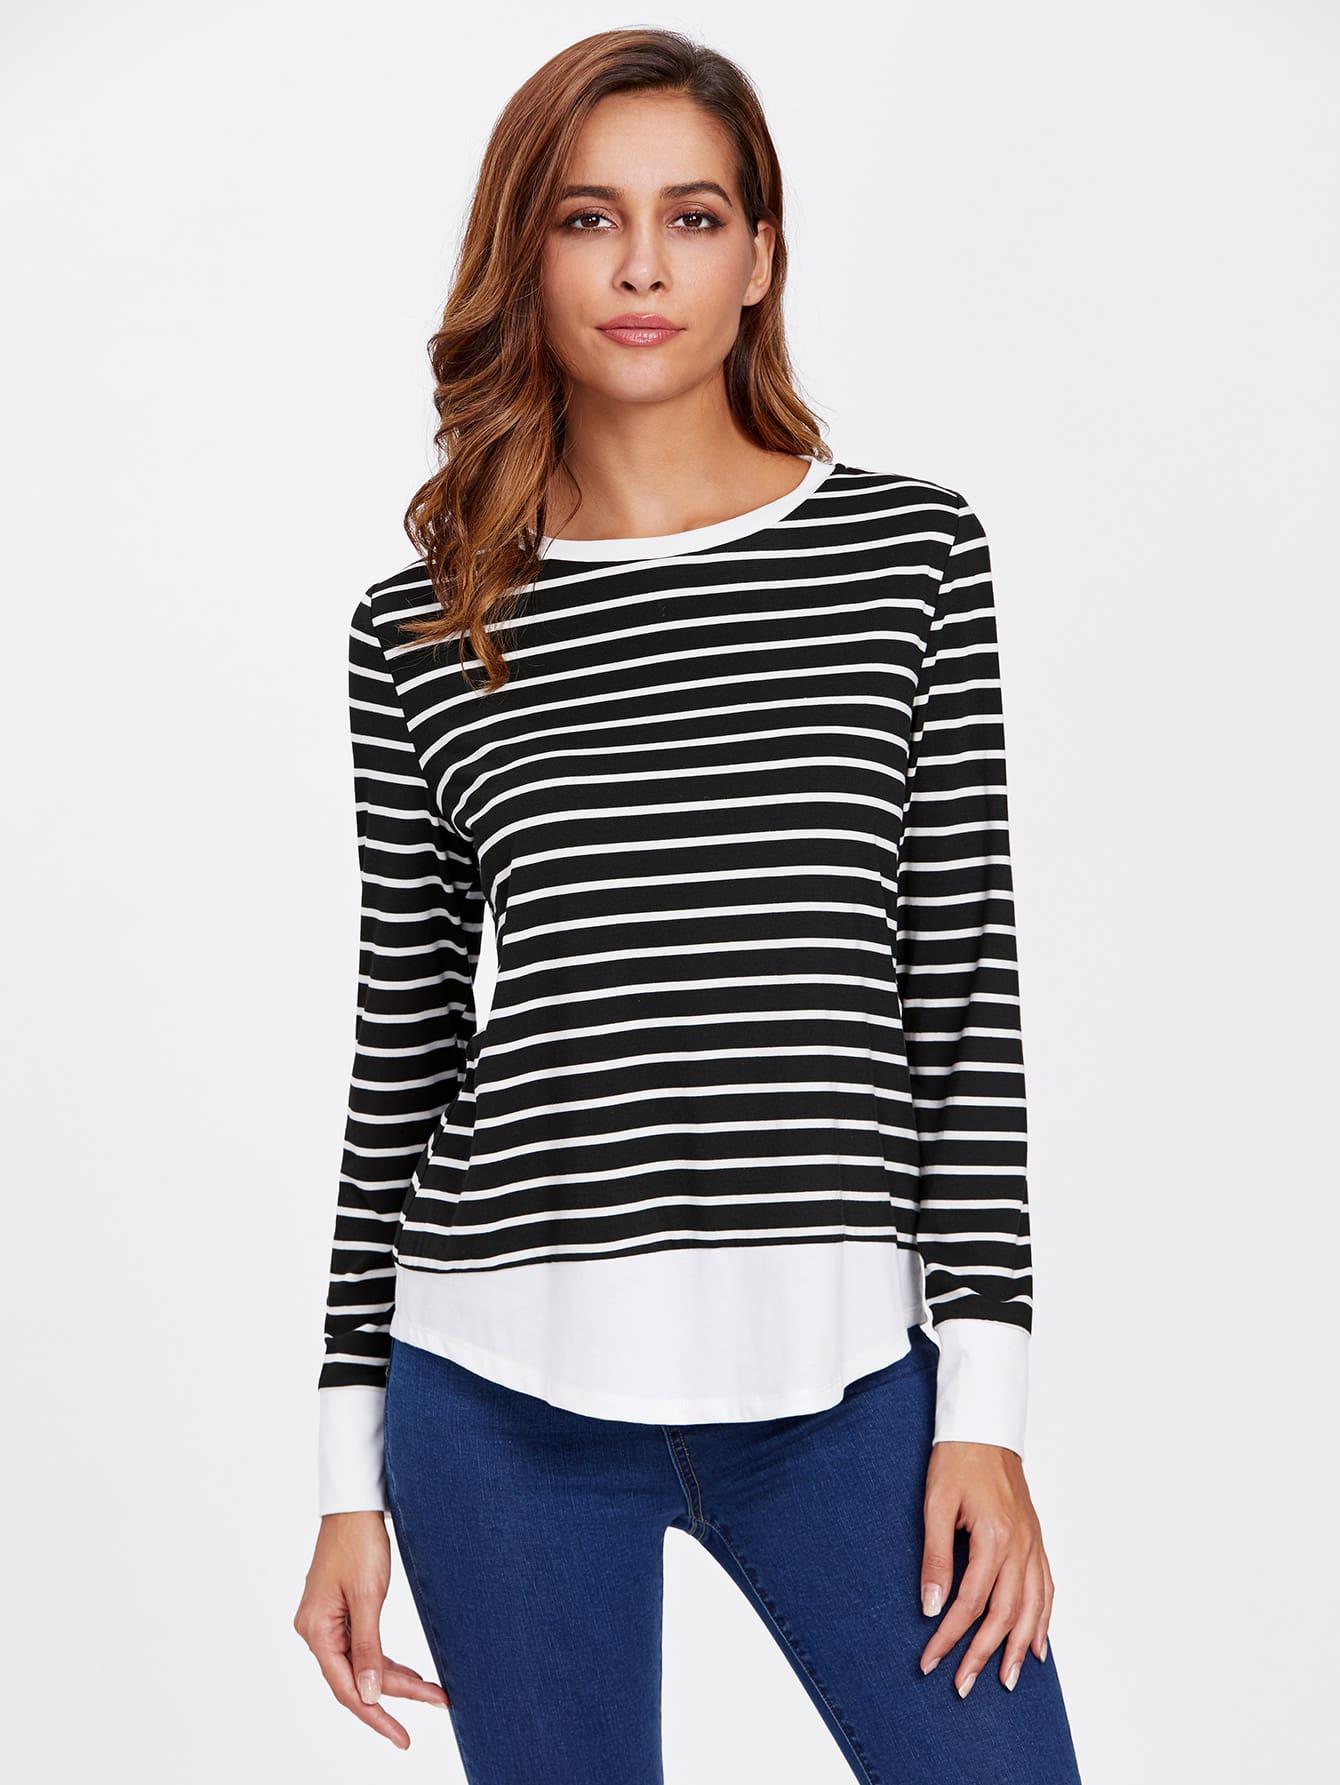 Contrast Trim Striped T-shirt giulia t shirt scollo v manica corta белый